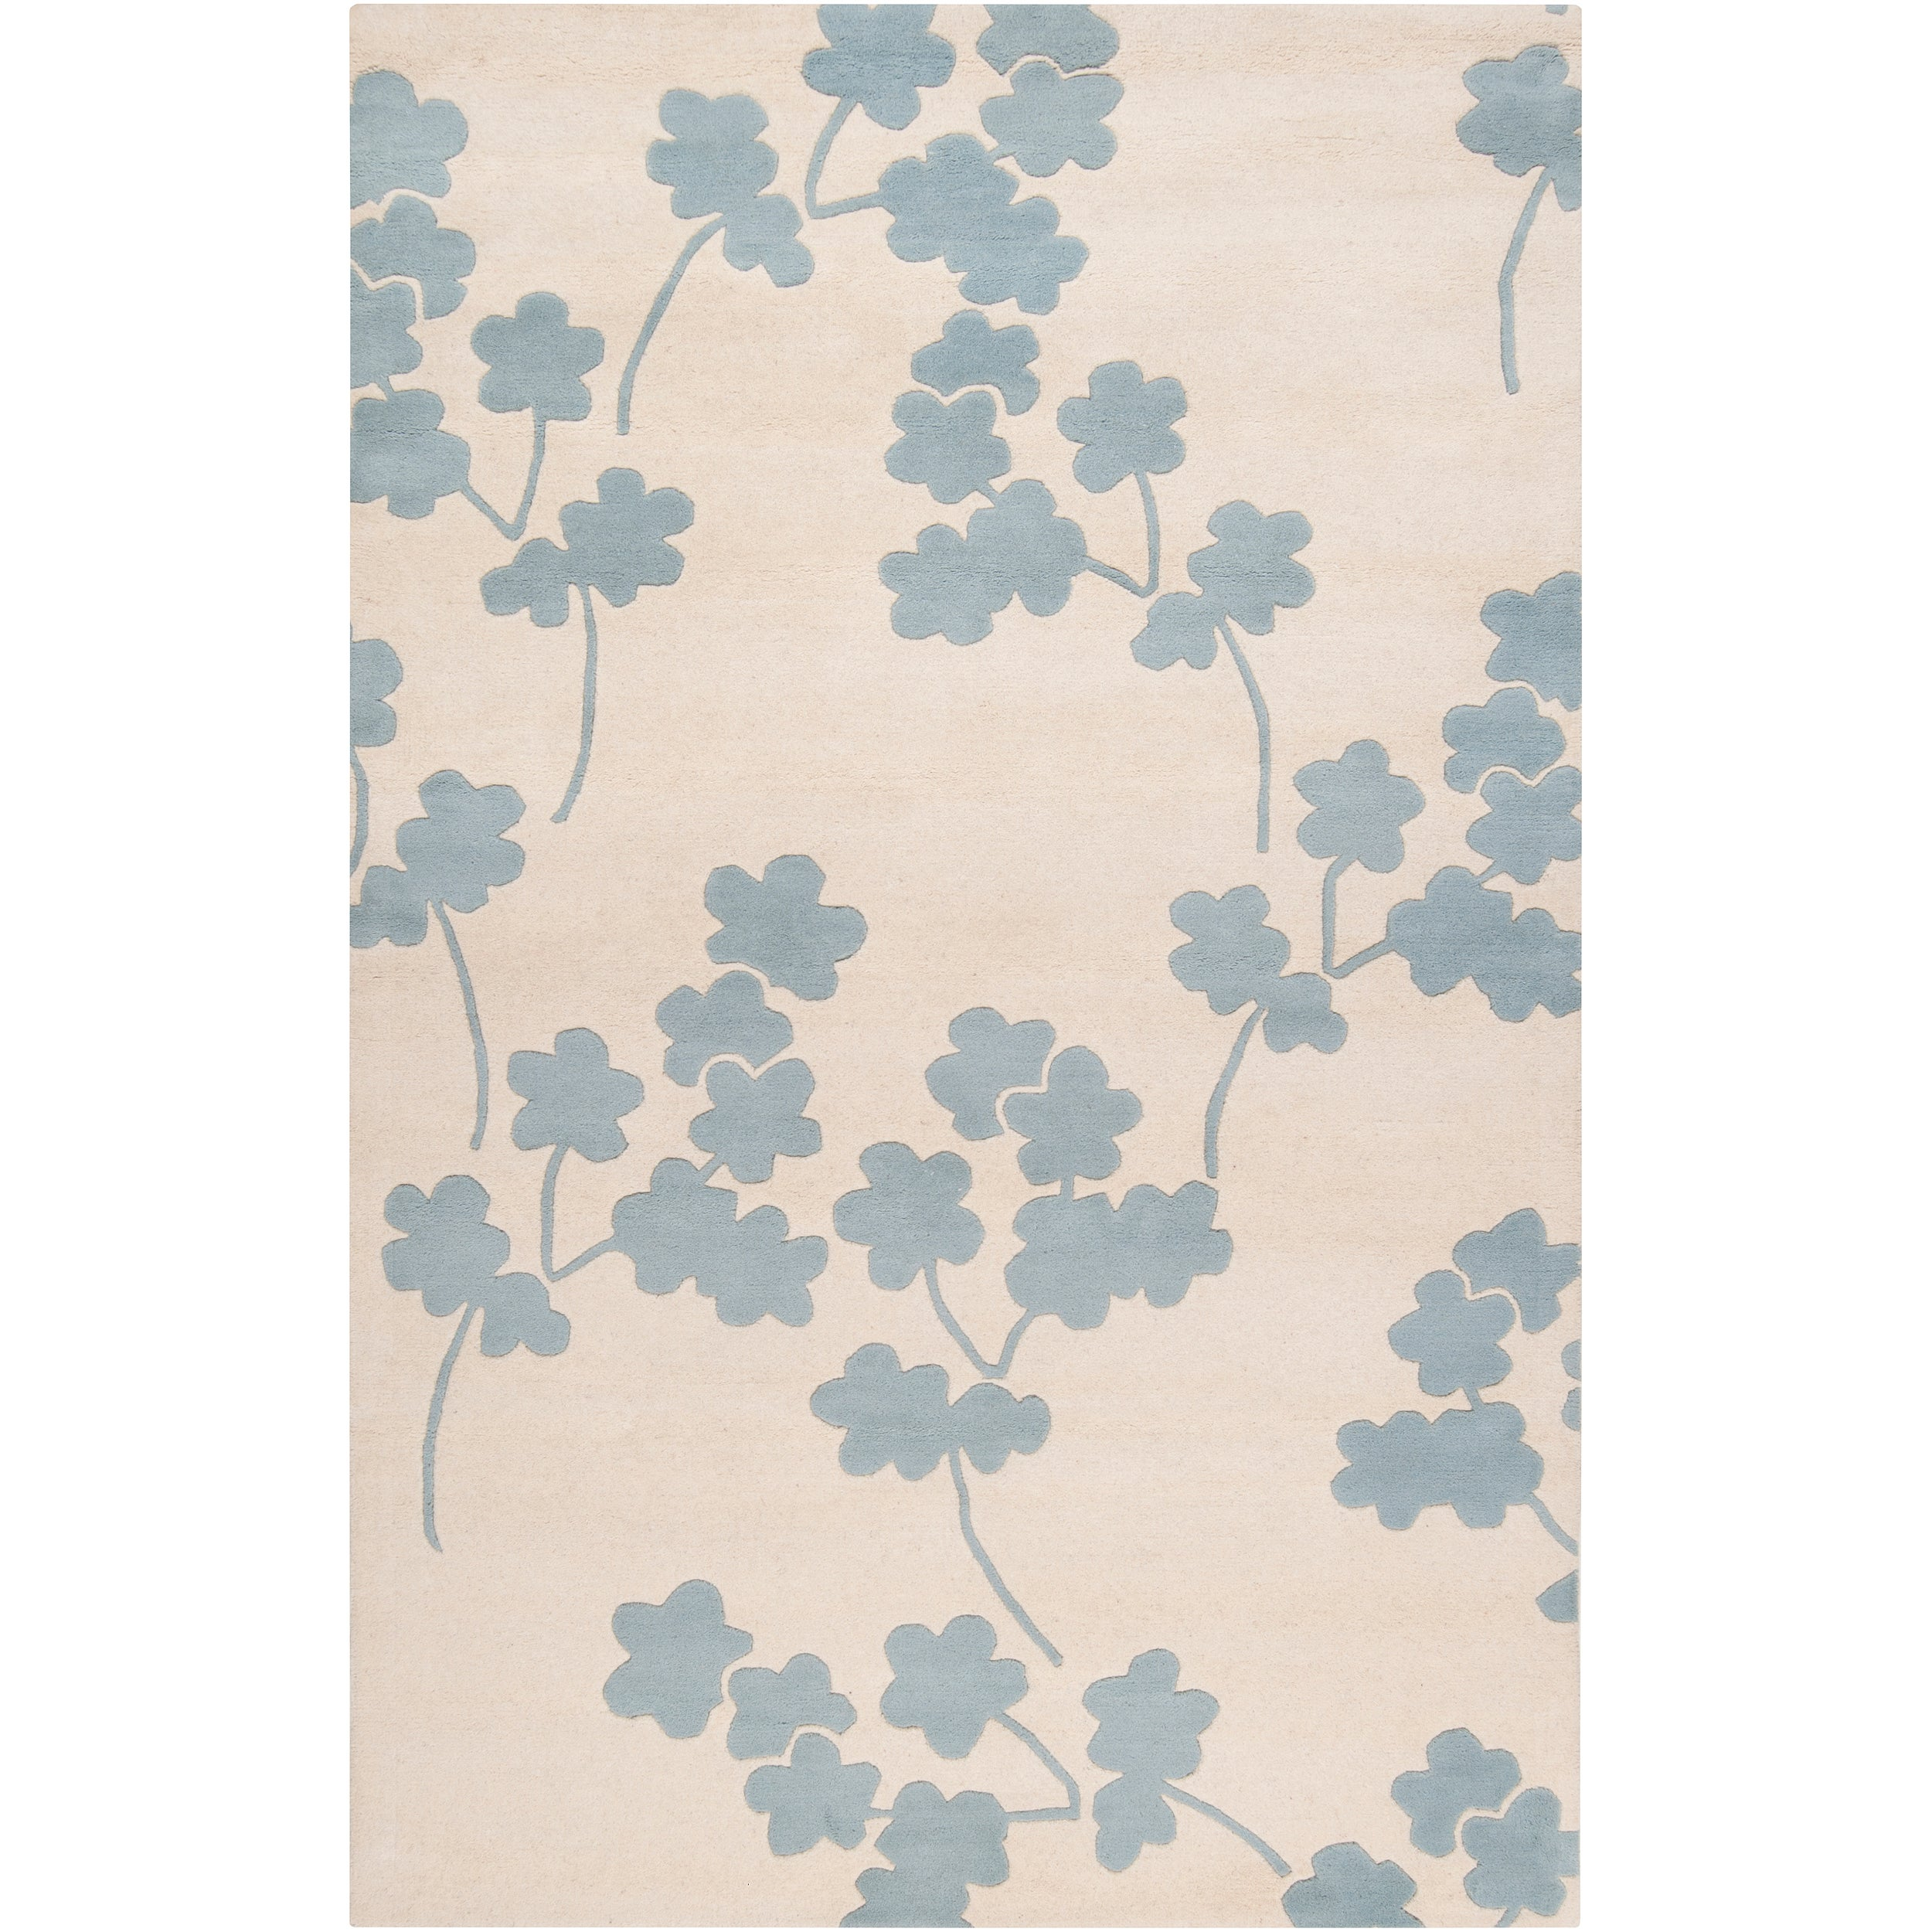 Jill Rosenwald Hand-tufted Blue Reelan Floral Wool Rug (8' x 11')